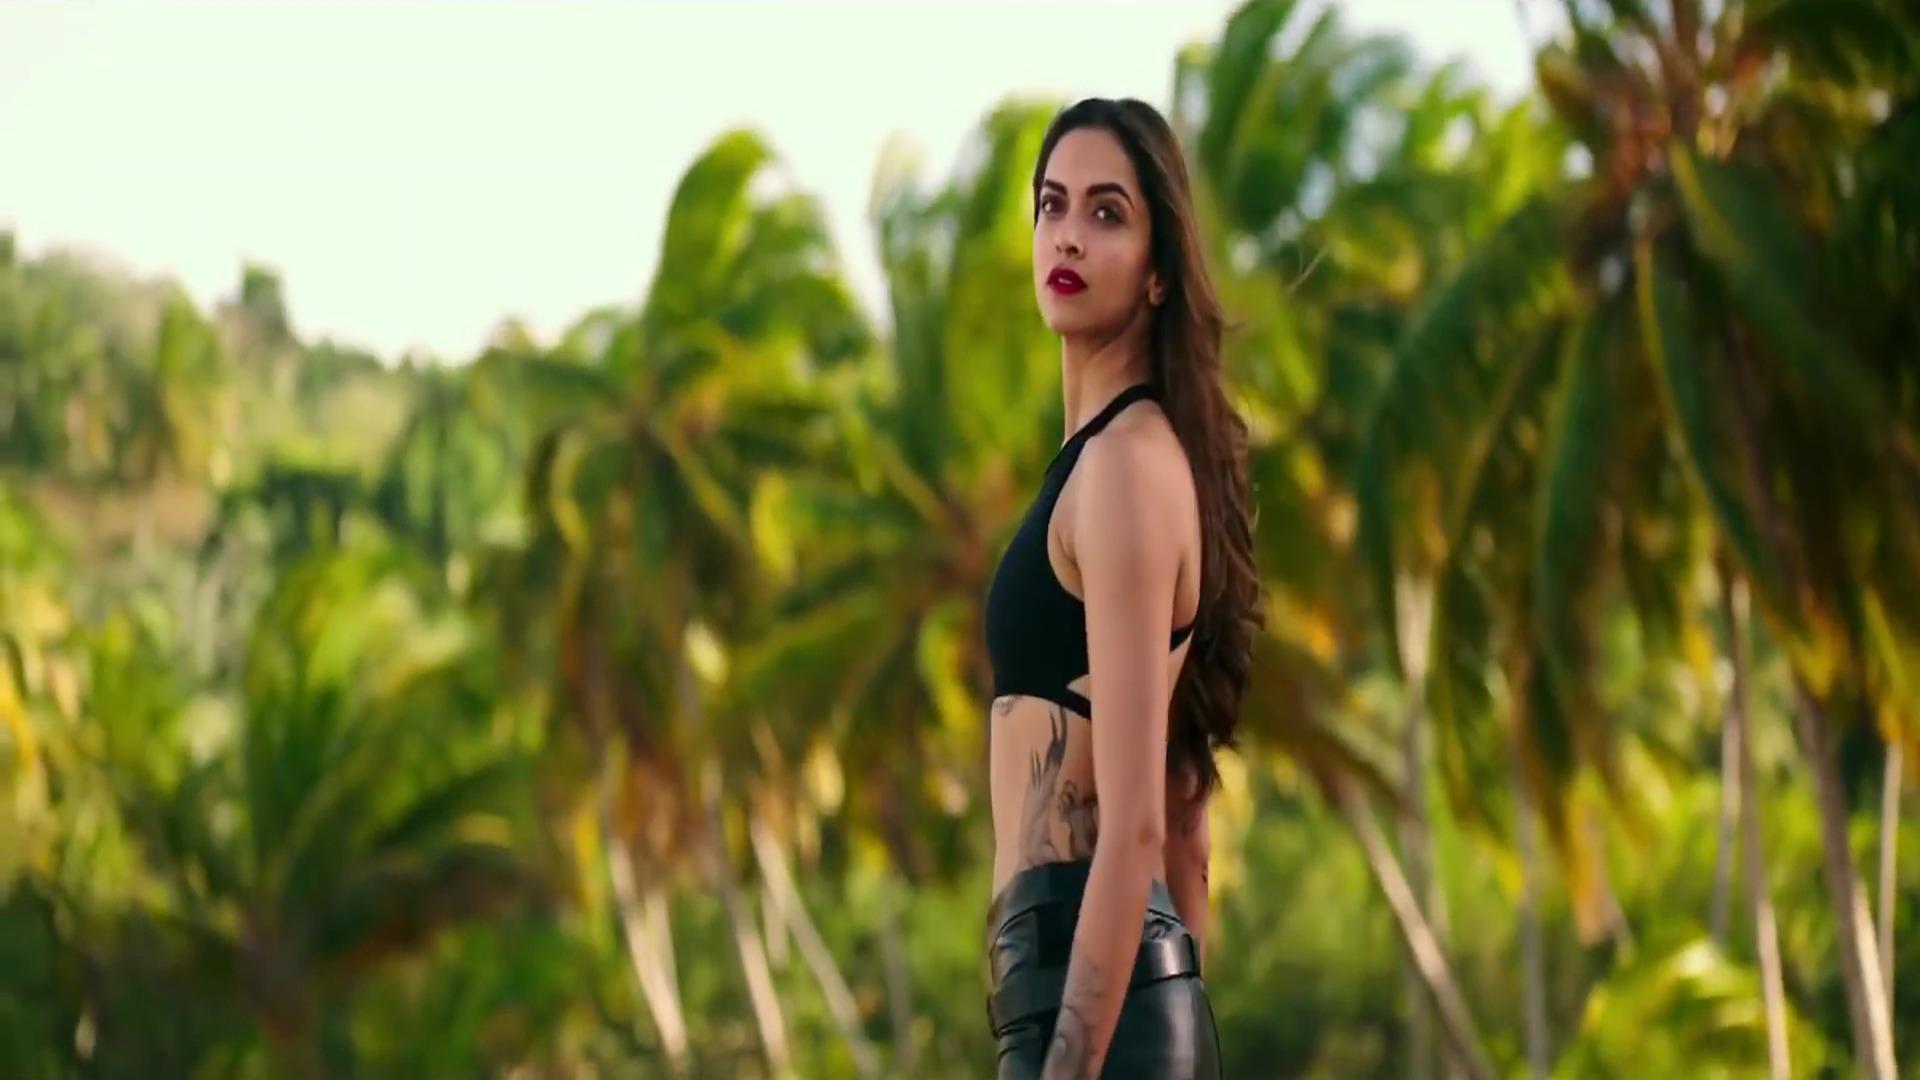 Deepika Padukone in XXX Film HD Wallpapers | HD Wallpapers